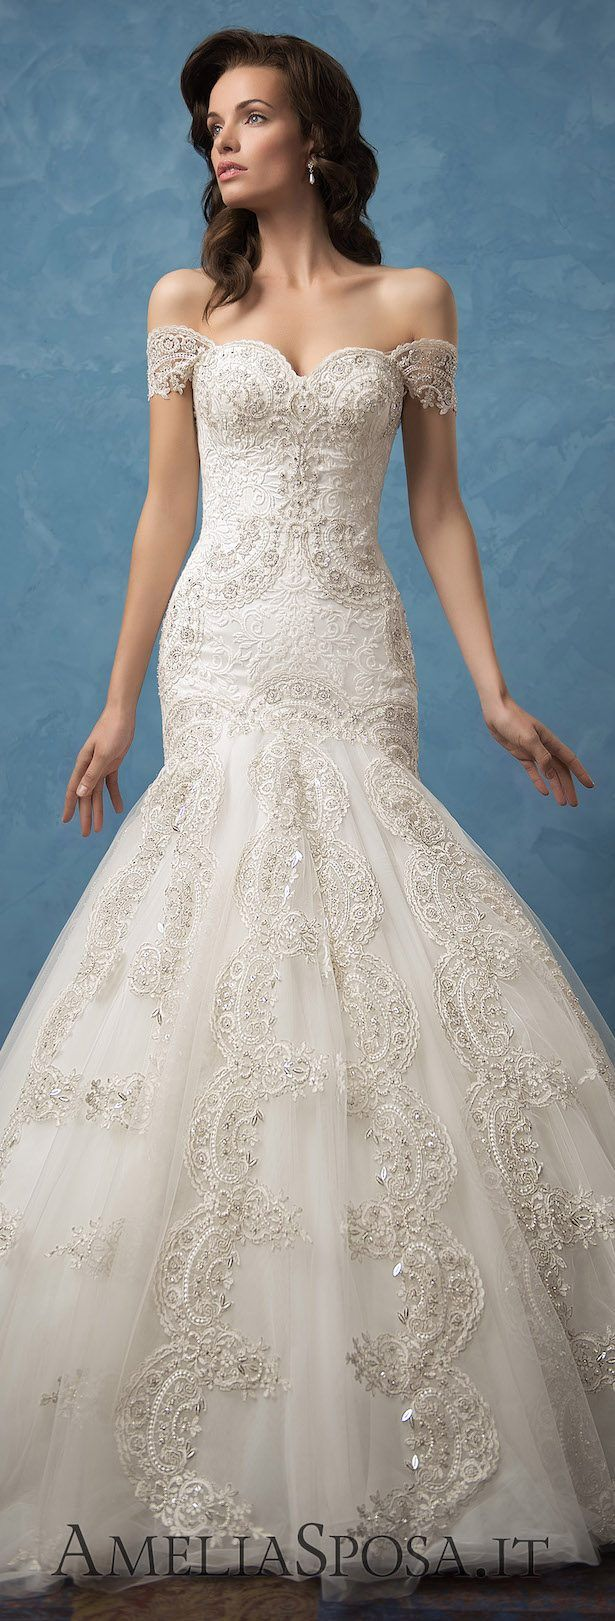 Lace wedding dress under 200 november 2018  best Wedding images on Pinterest  Weddings Wedding ideas and